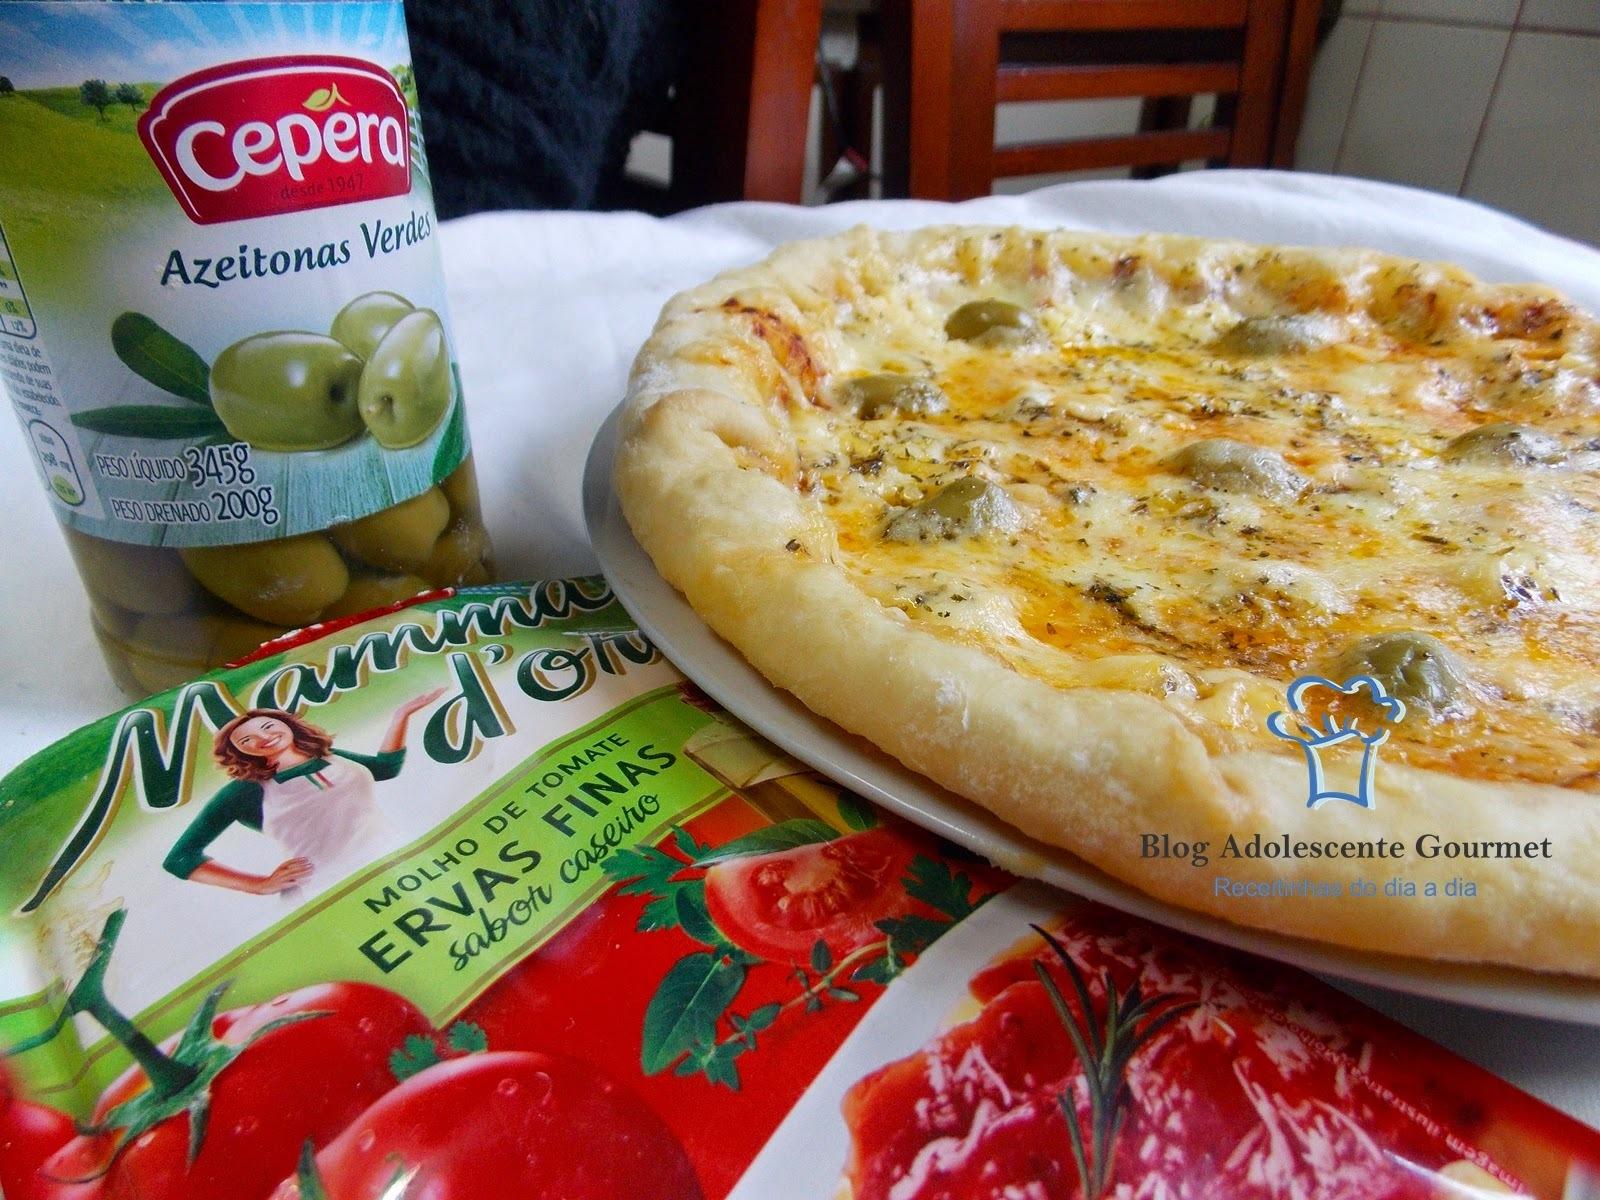 Pizza de dois queijos Cepera